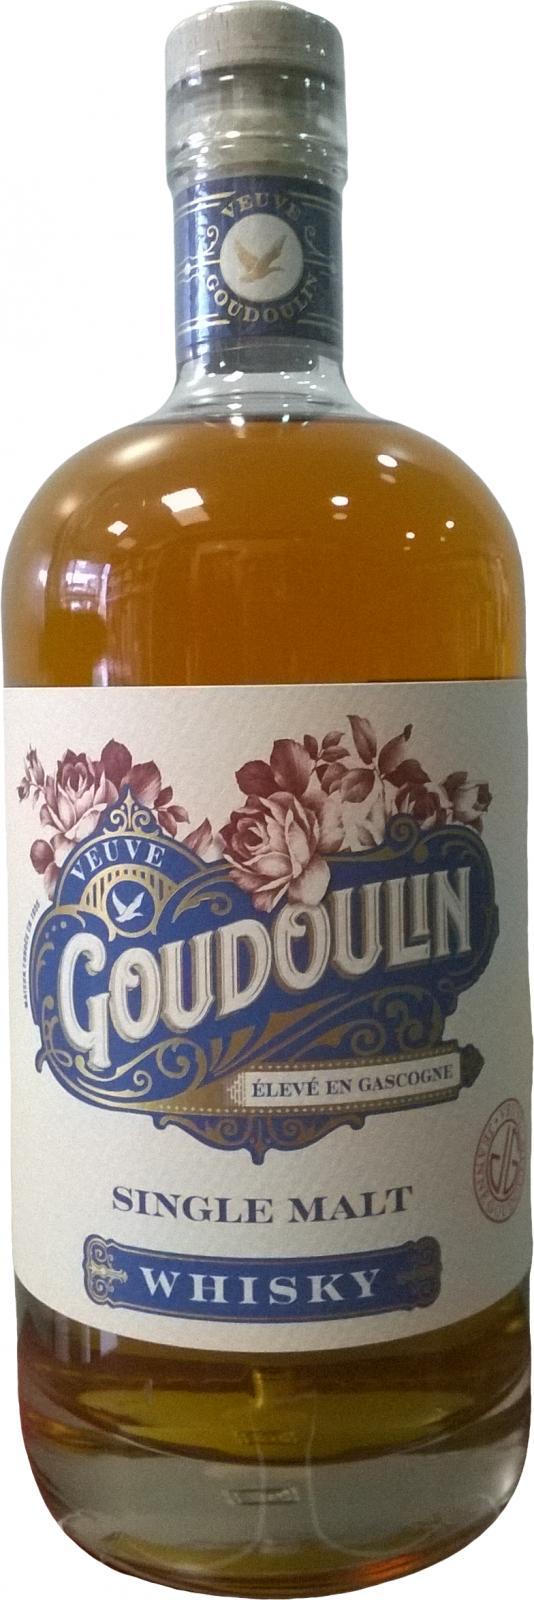 Veuve Goudoulin Single Malt Whisky